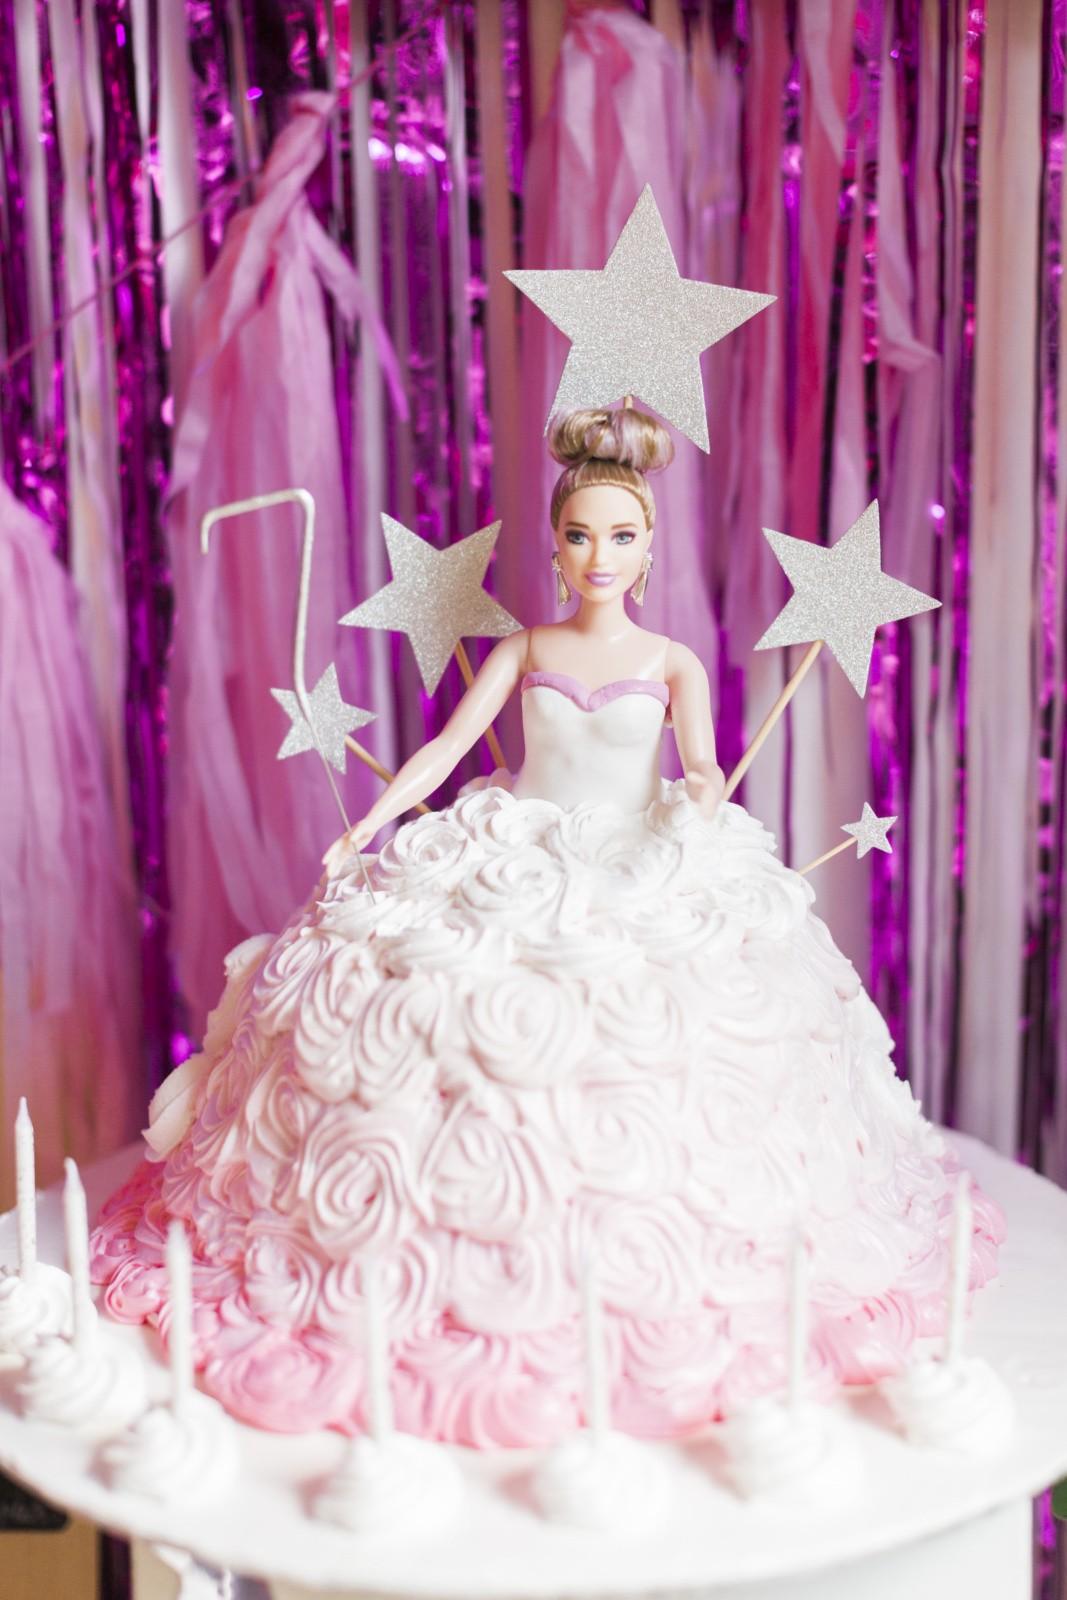 Barbie Birthday Party Cake